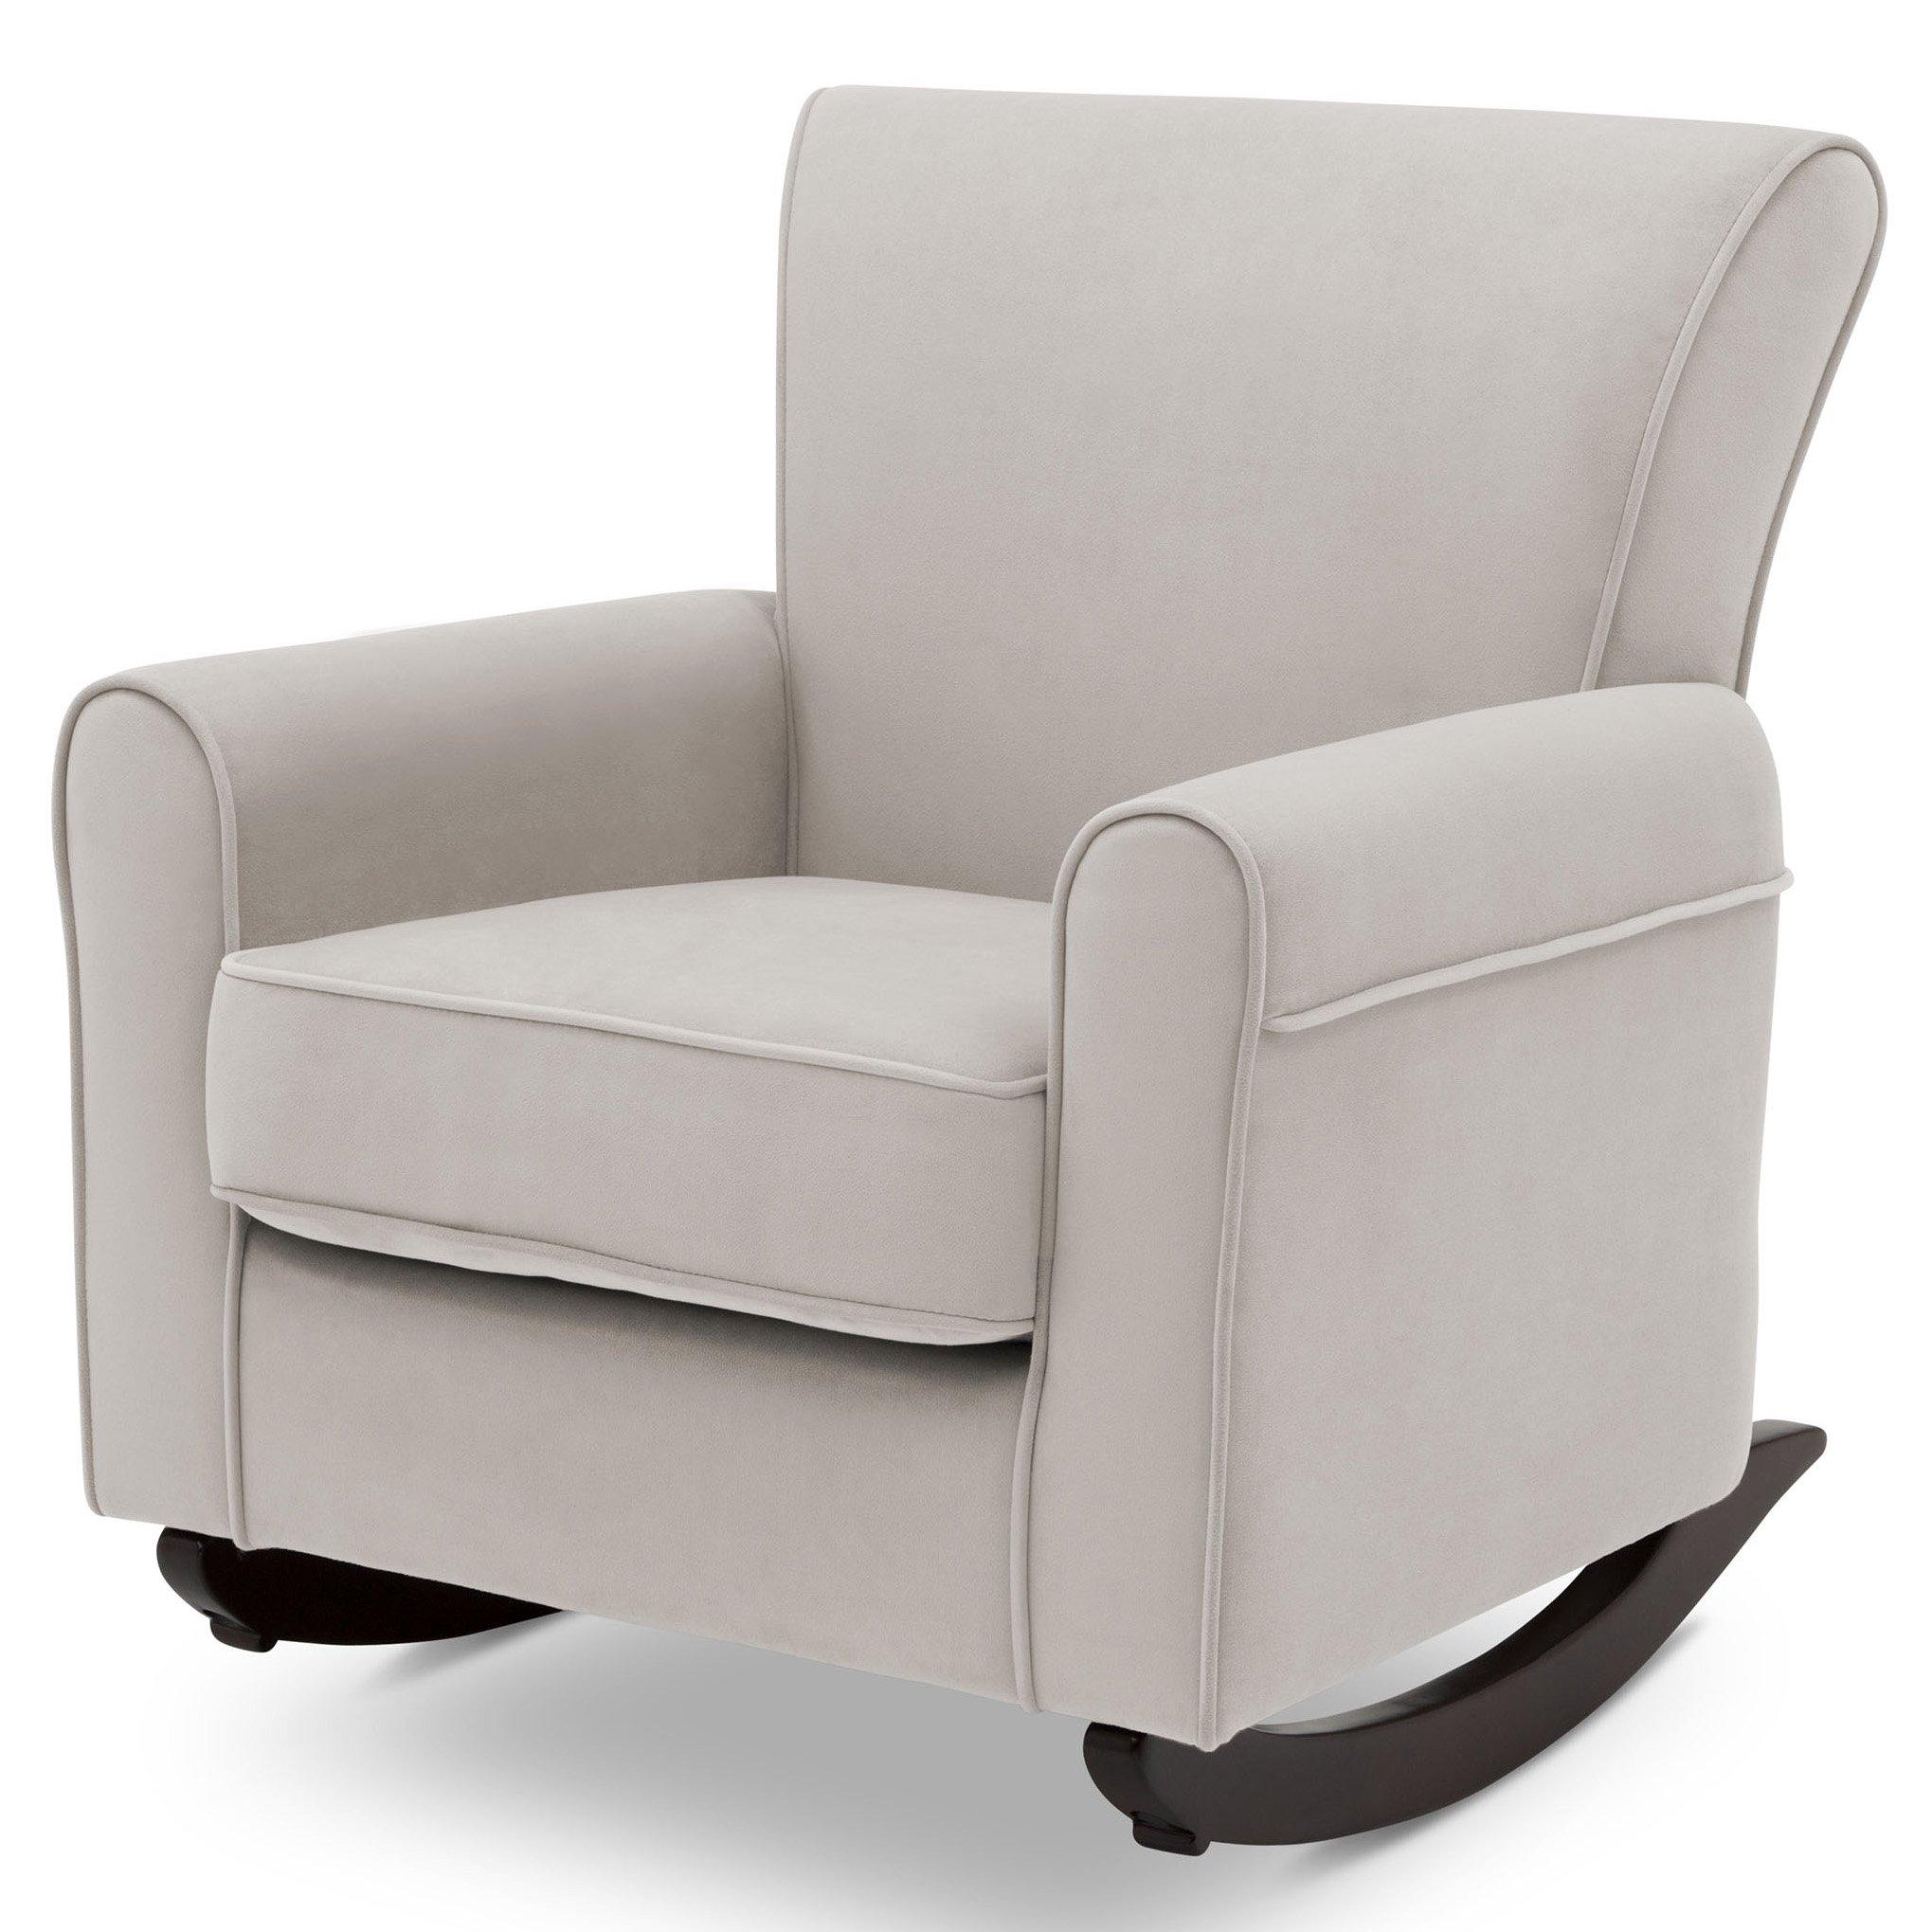 Delta Children Lancaster Rocking Chair featuring Live Smart Fabric, Linen